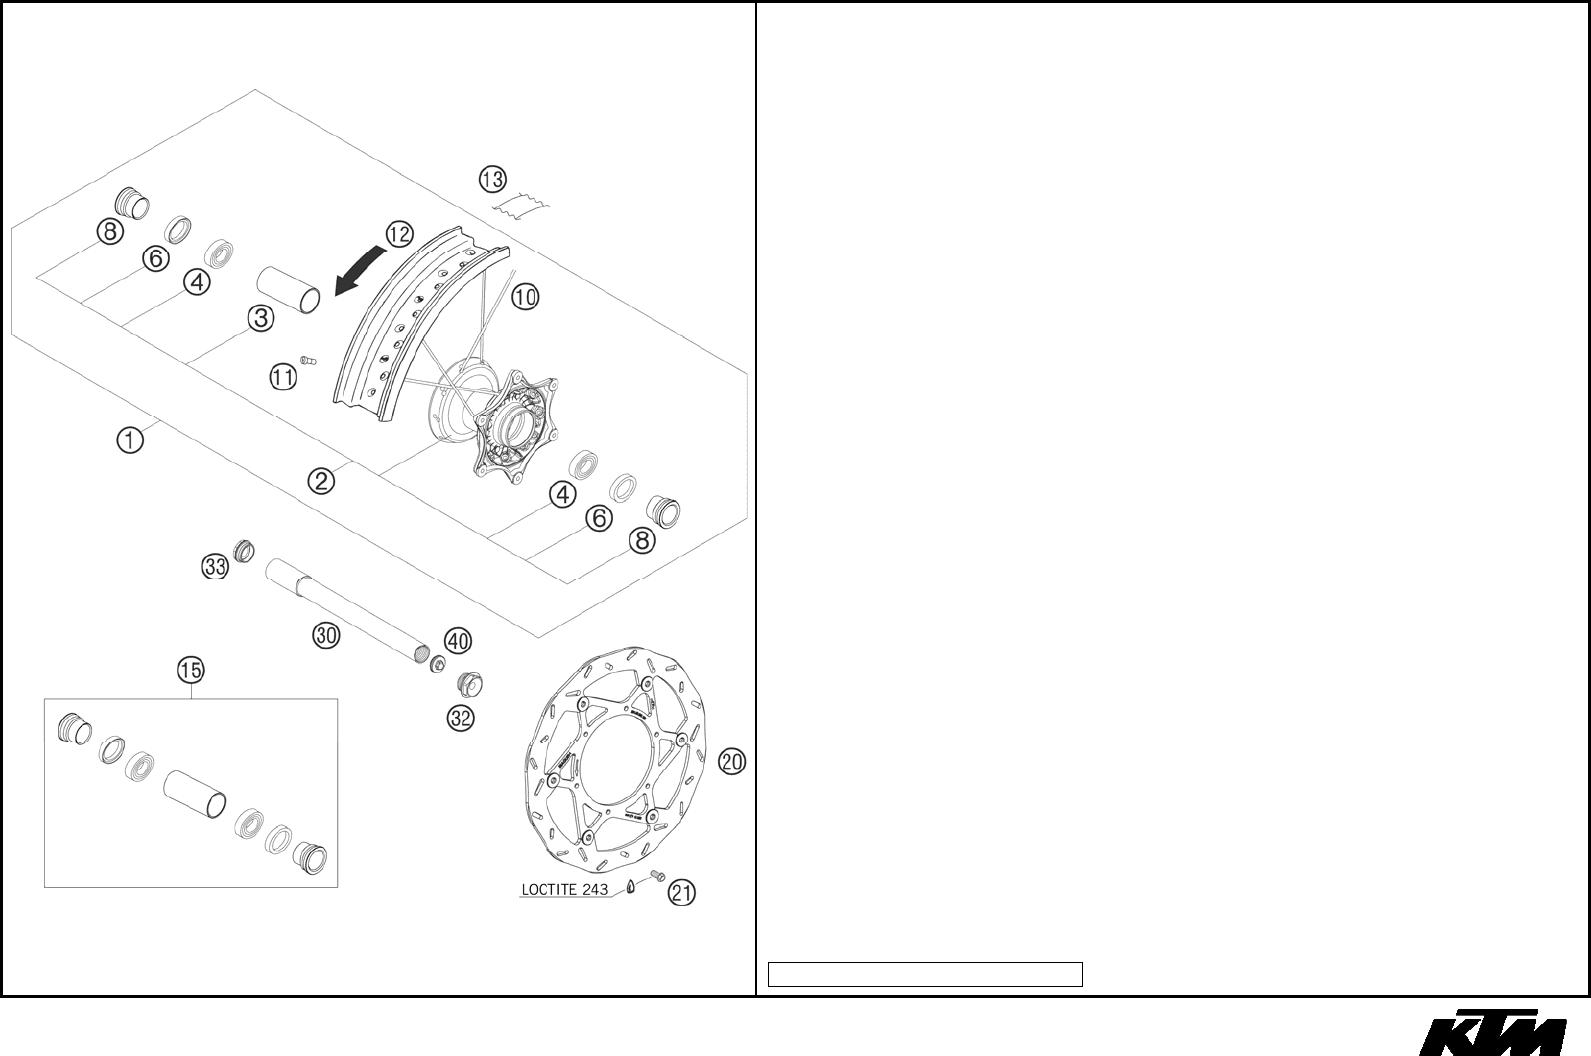 Ktm 3cf8403h0en Users Manual Wire Schematic 450 Smr 2008